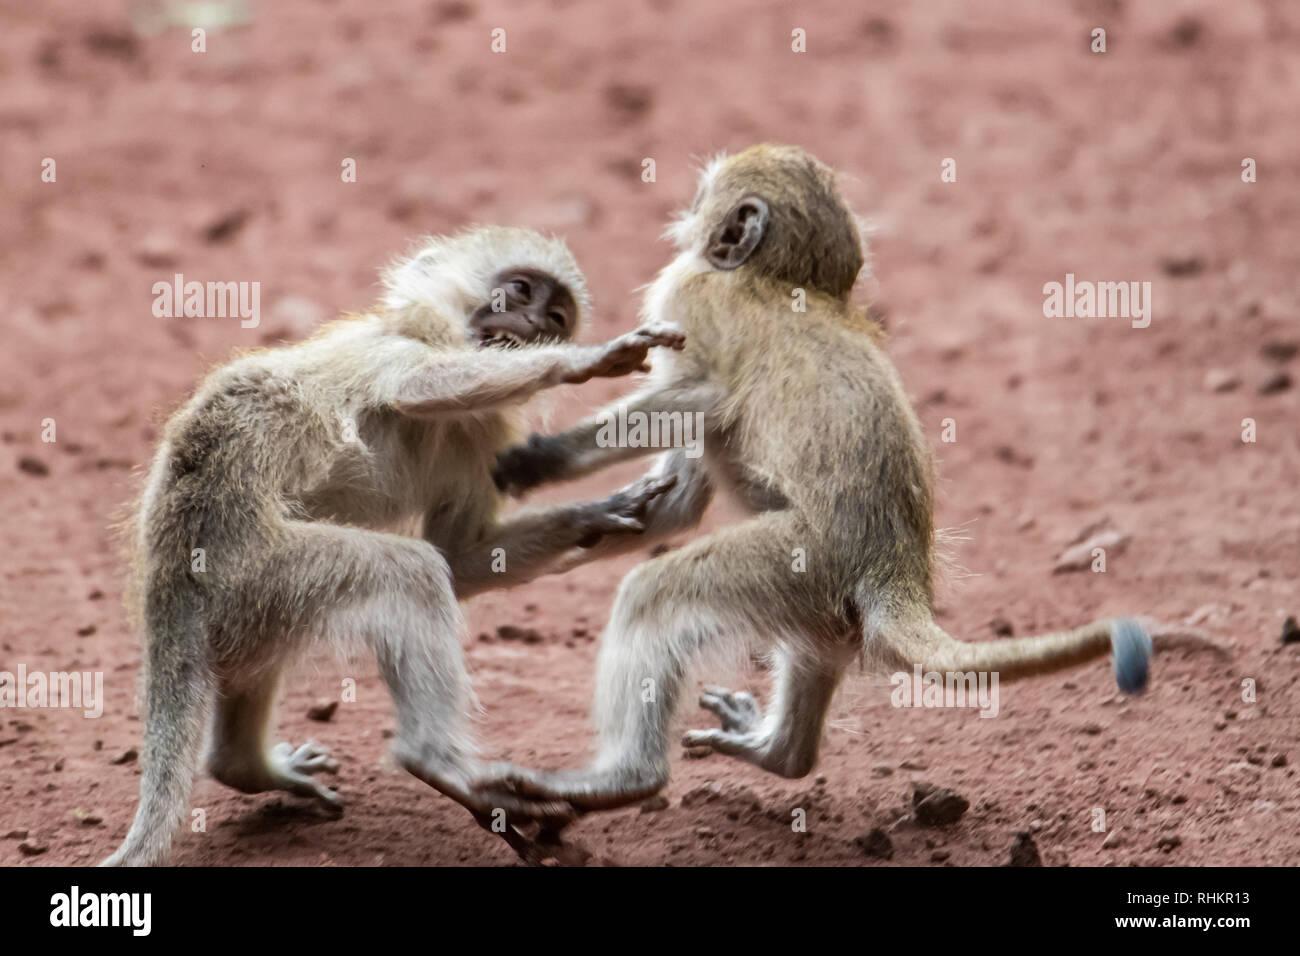 Pair of vervet monkeys playing - Stock Image